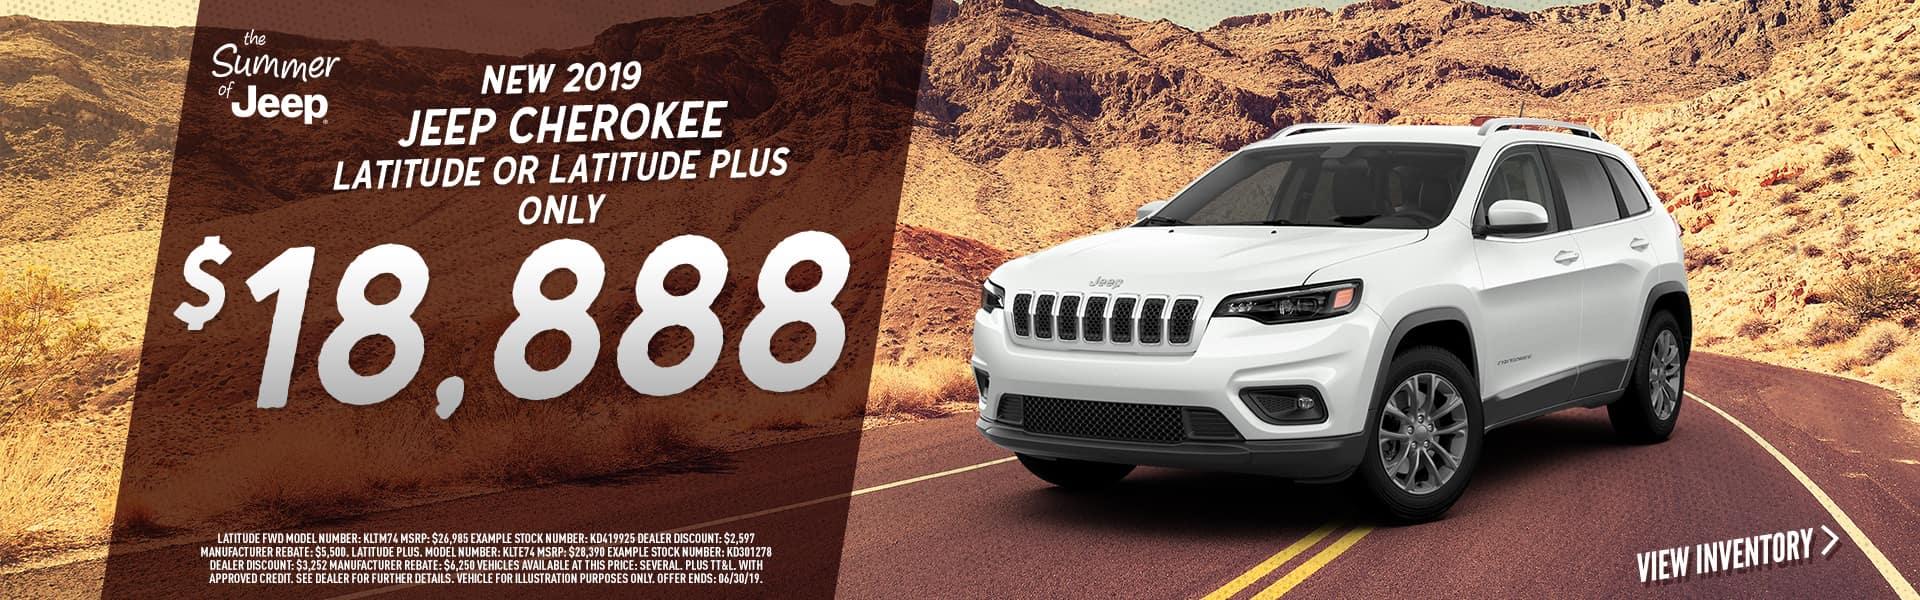 2019-Jeep-Cherokee-Latitude-Latitude-Plus